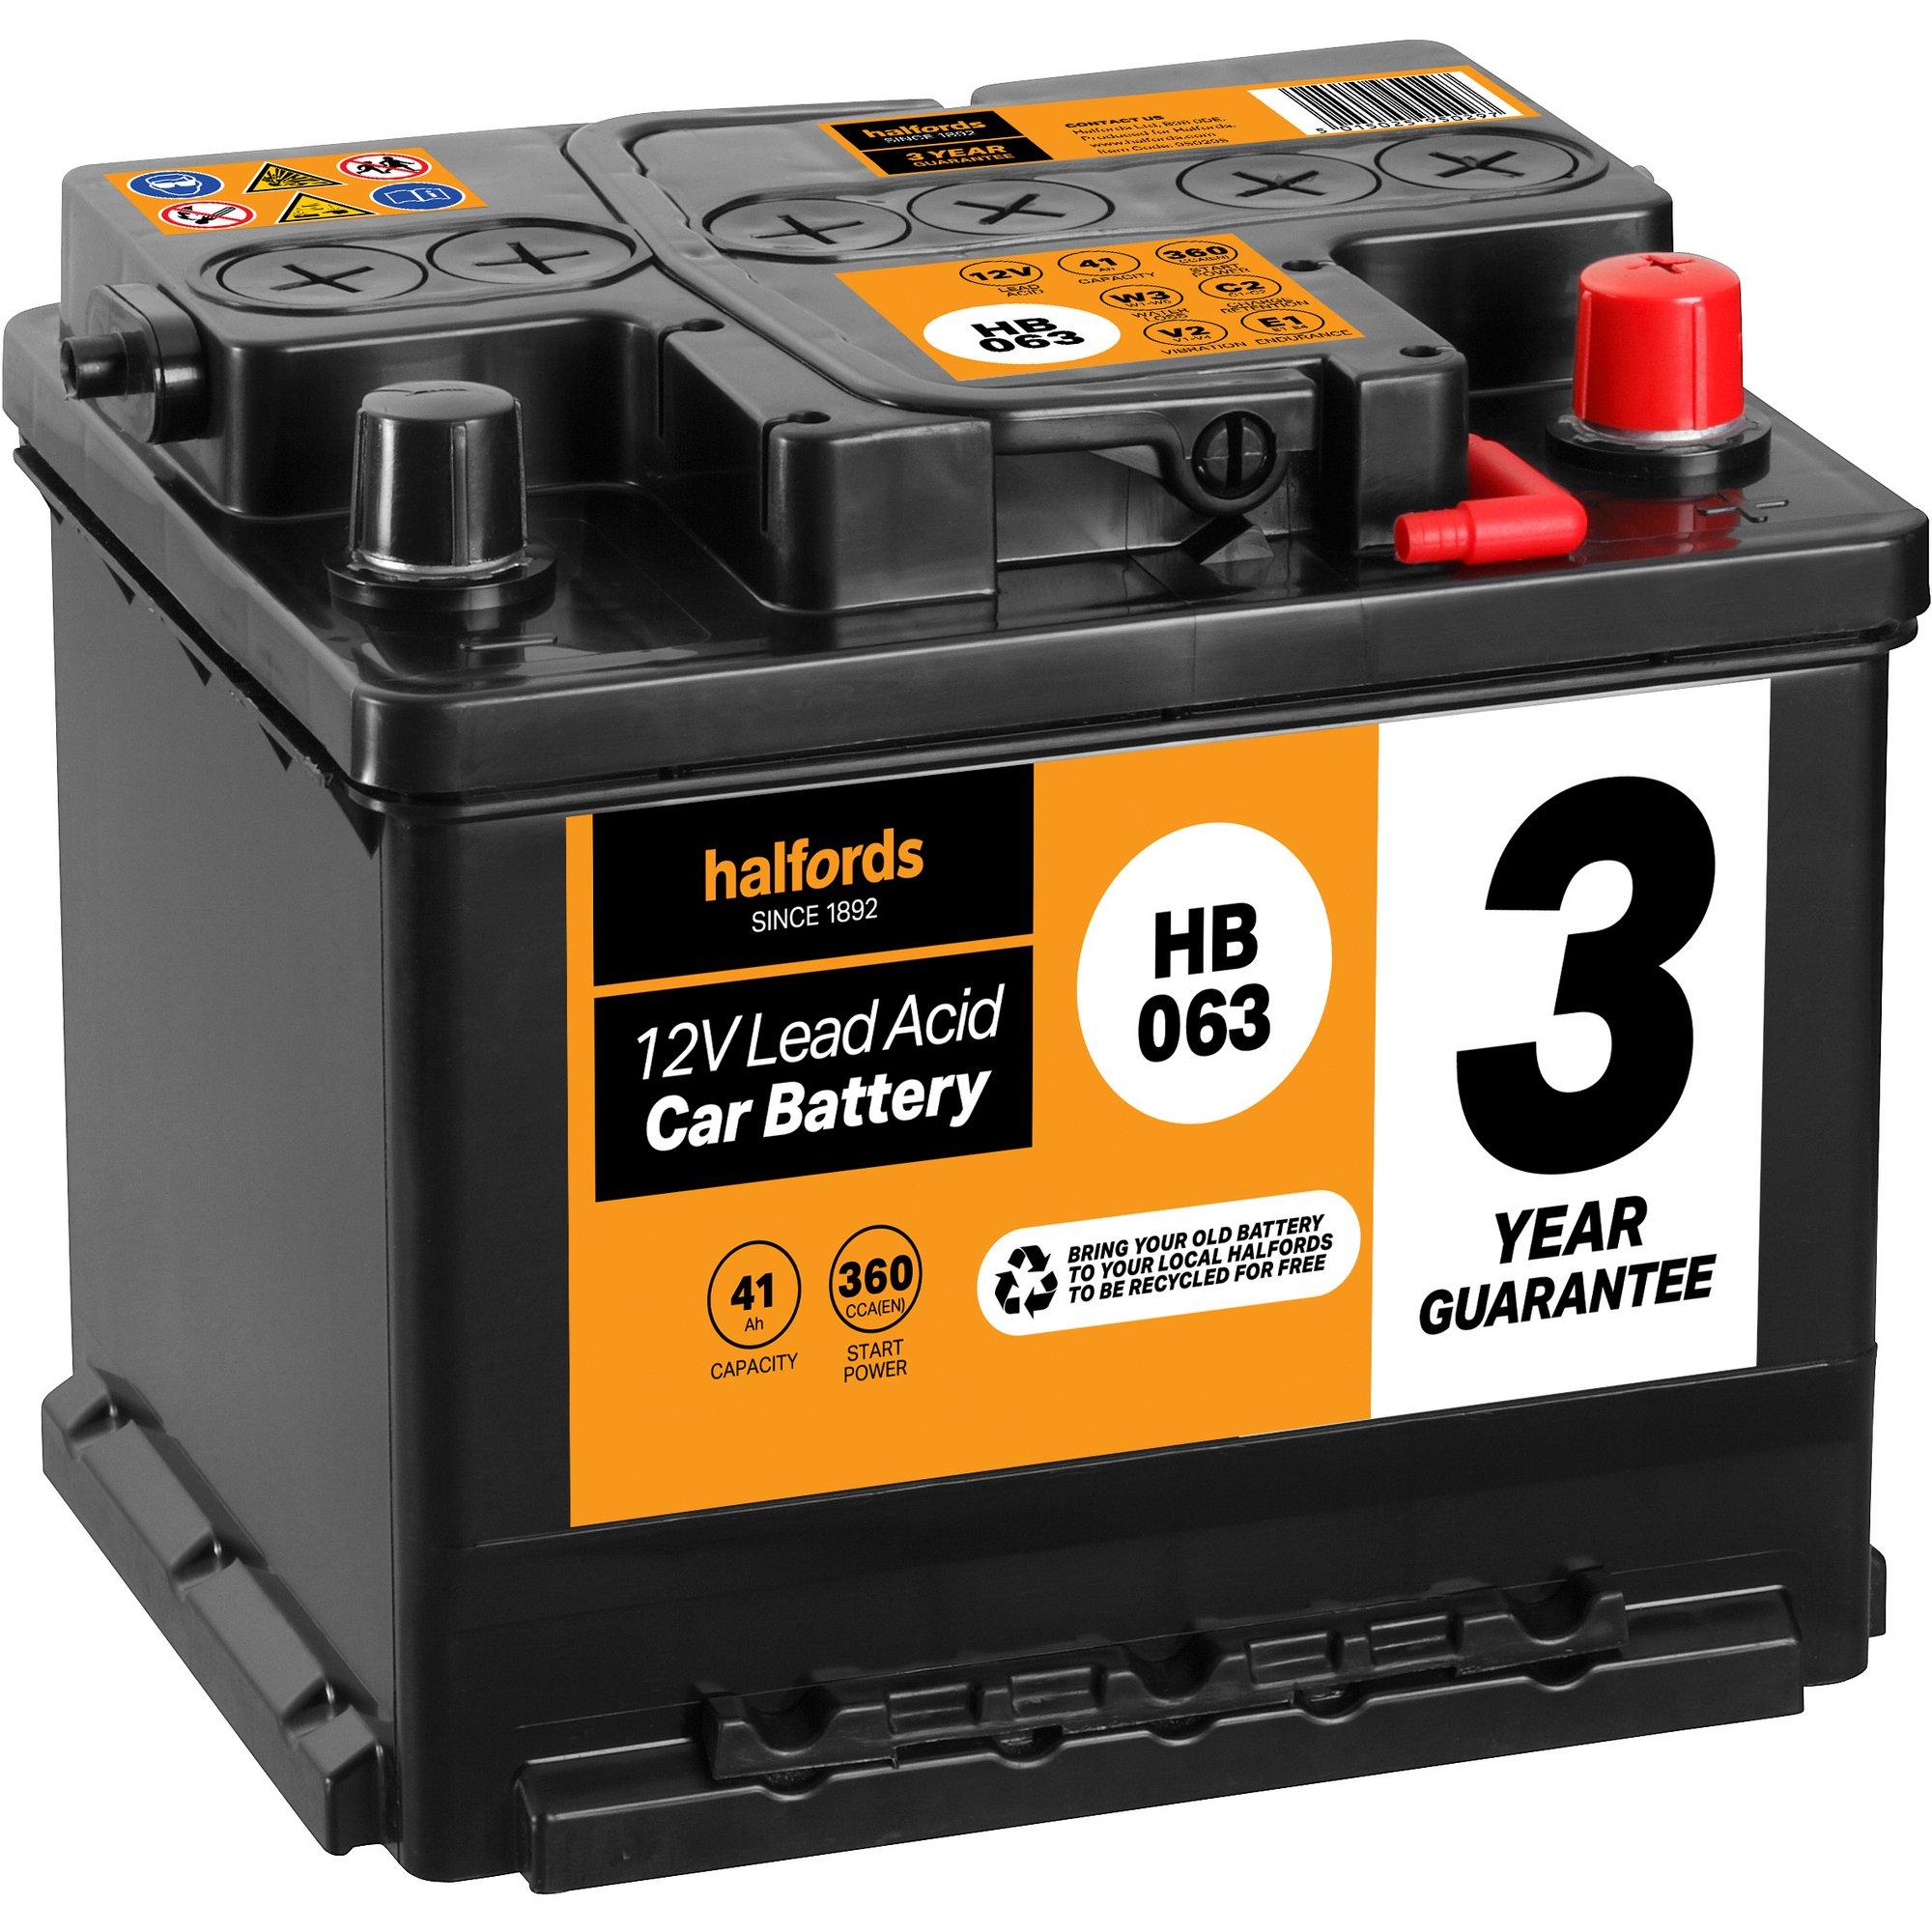 compare car insurance compare automotive batteries. Black Bedroom Furniture Sets. Home Design Ideas